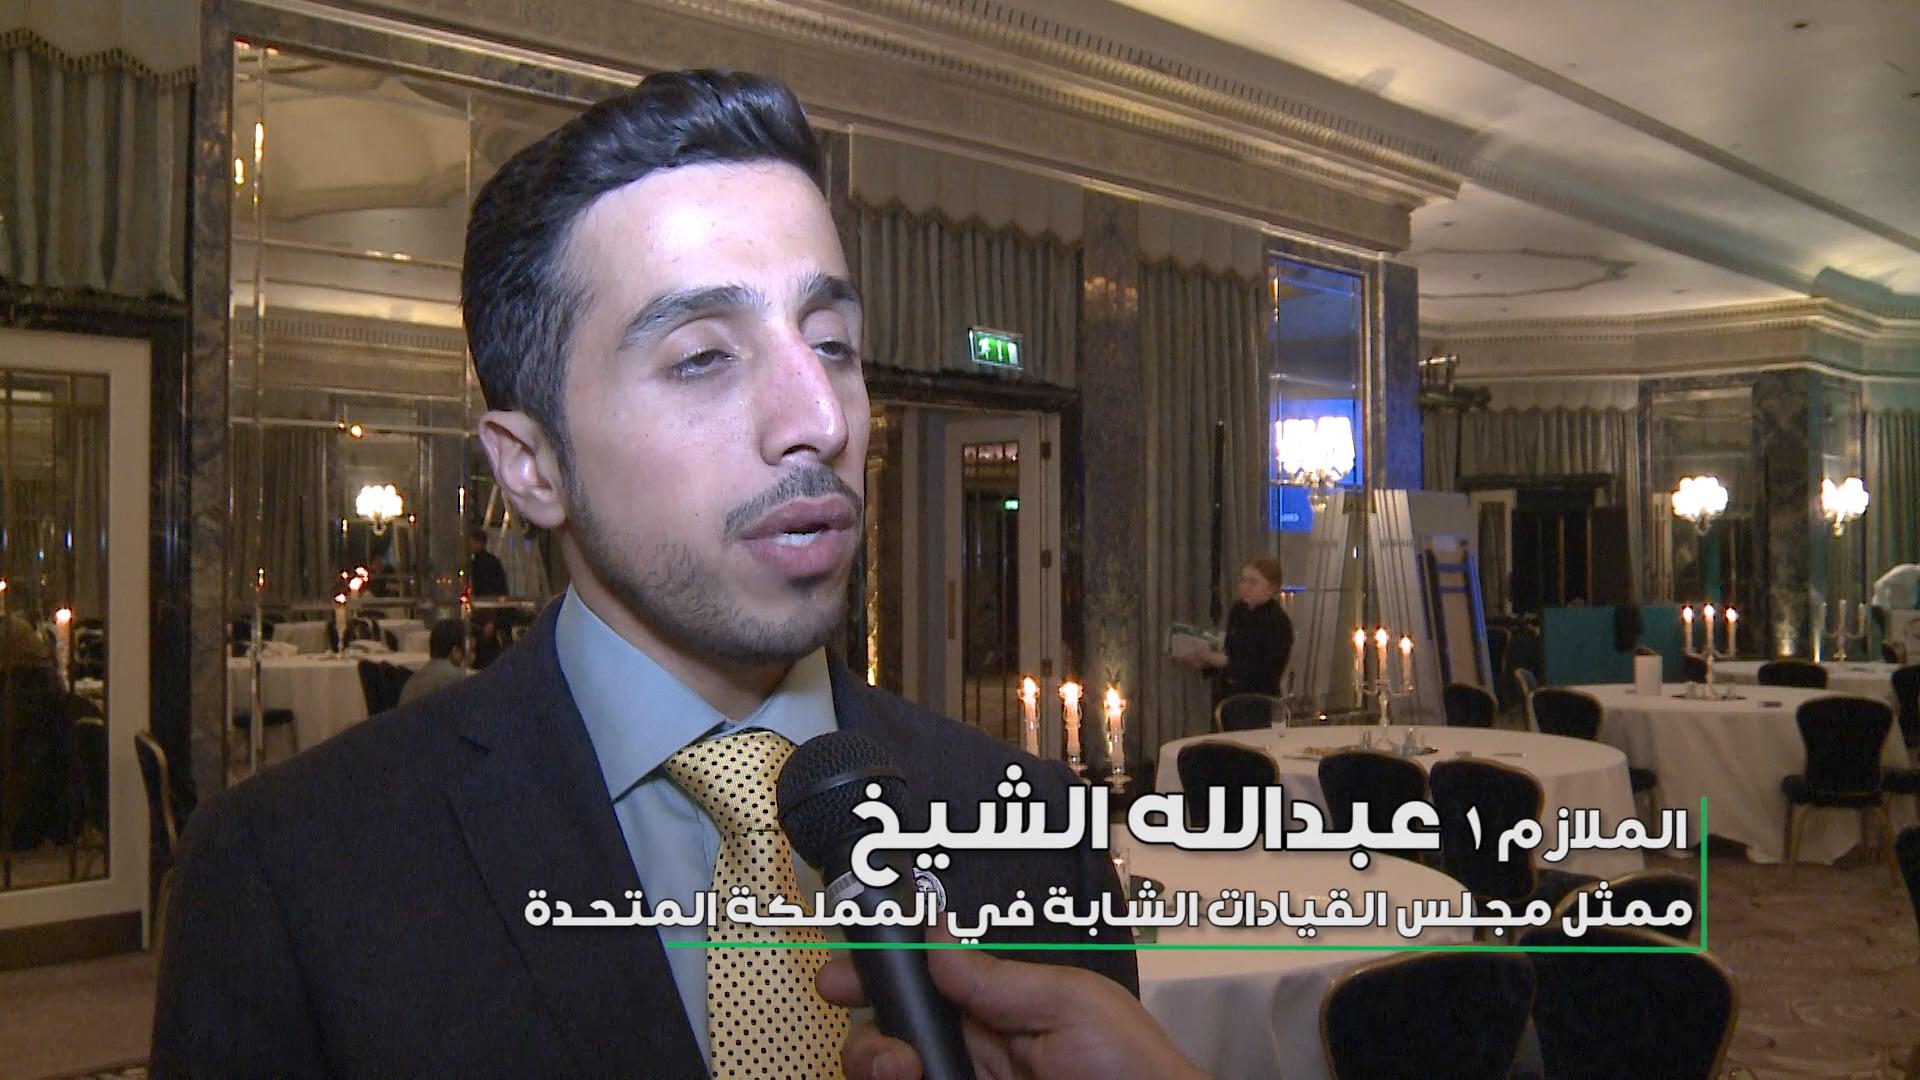 Dr. Abdulla HQ